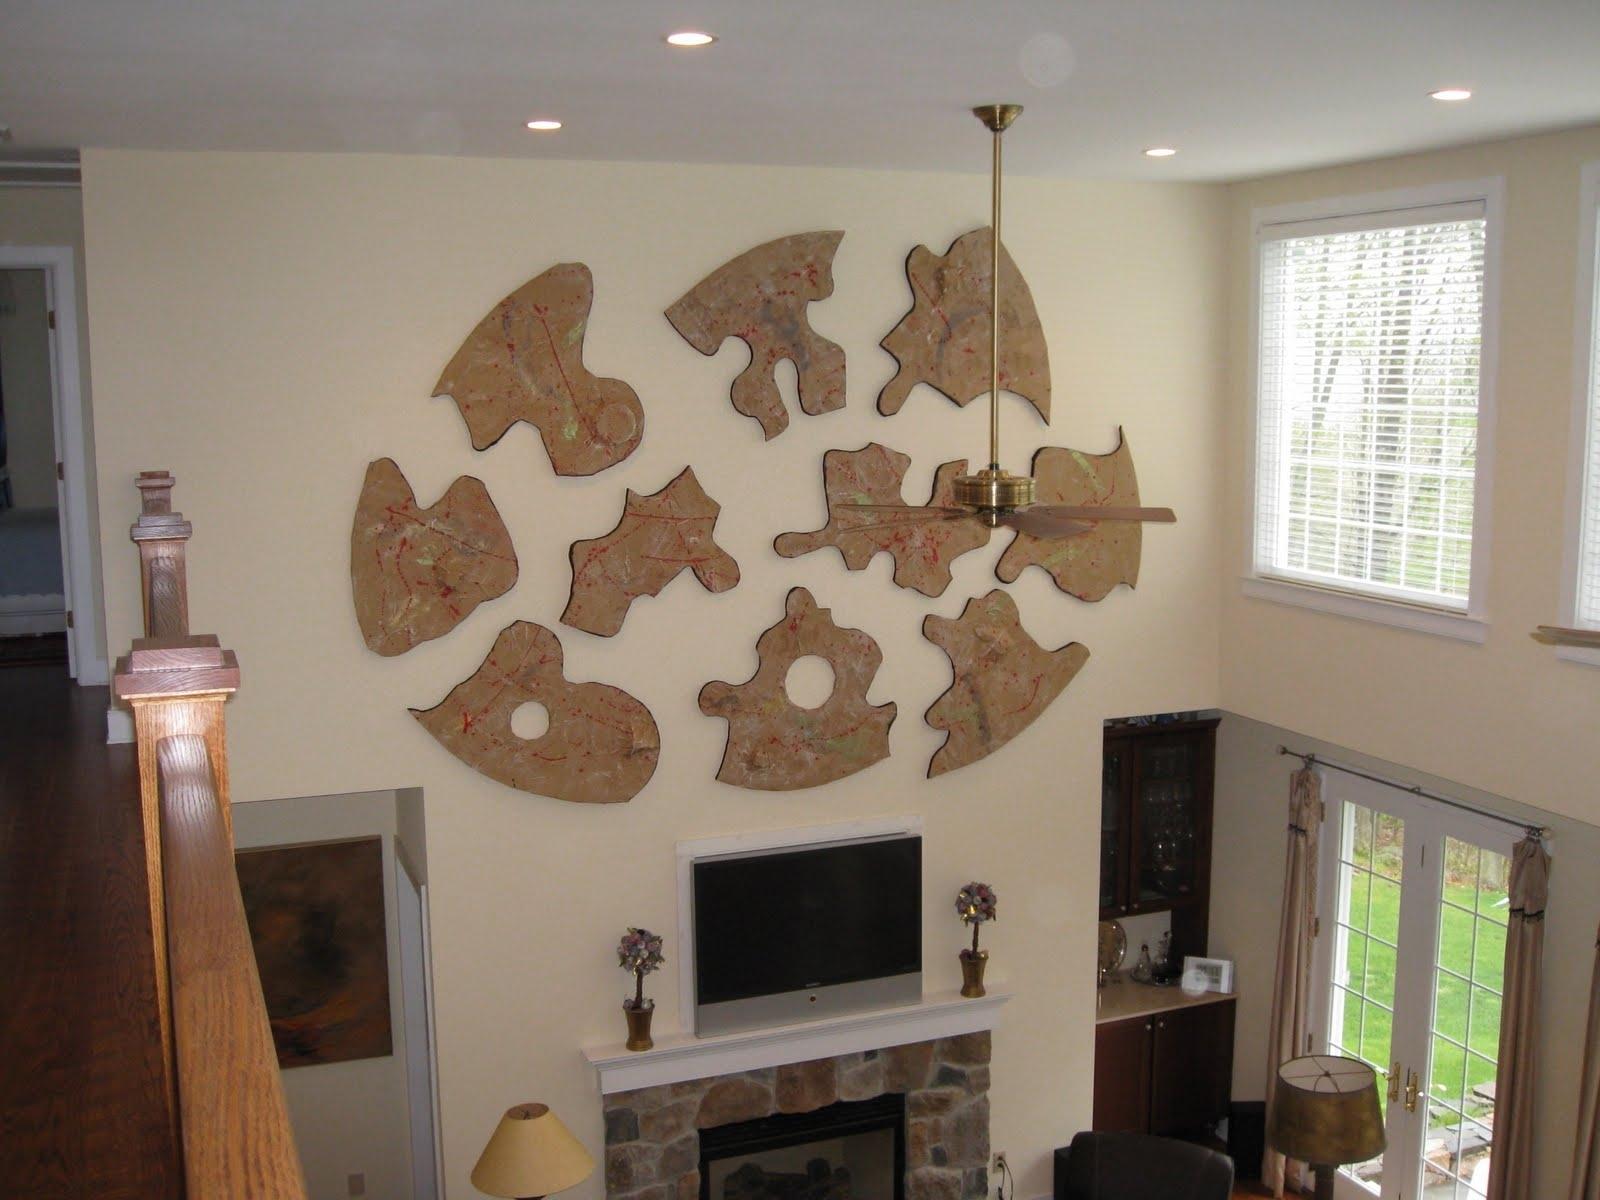 Art Angel: Big Wall Art: Puzzle In Preferred Big Wall Art (View 4 of 15)